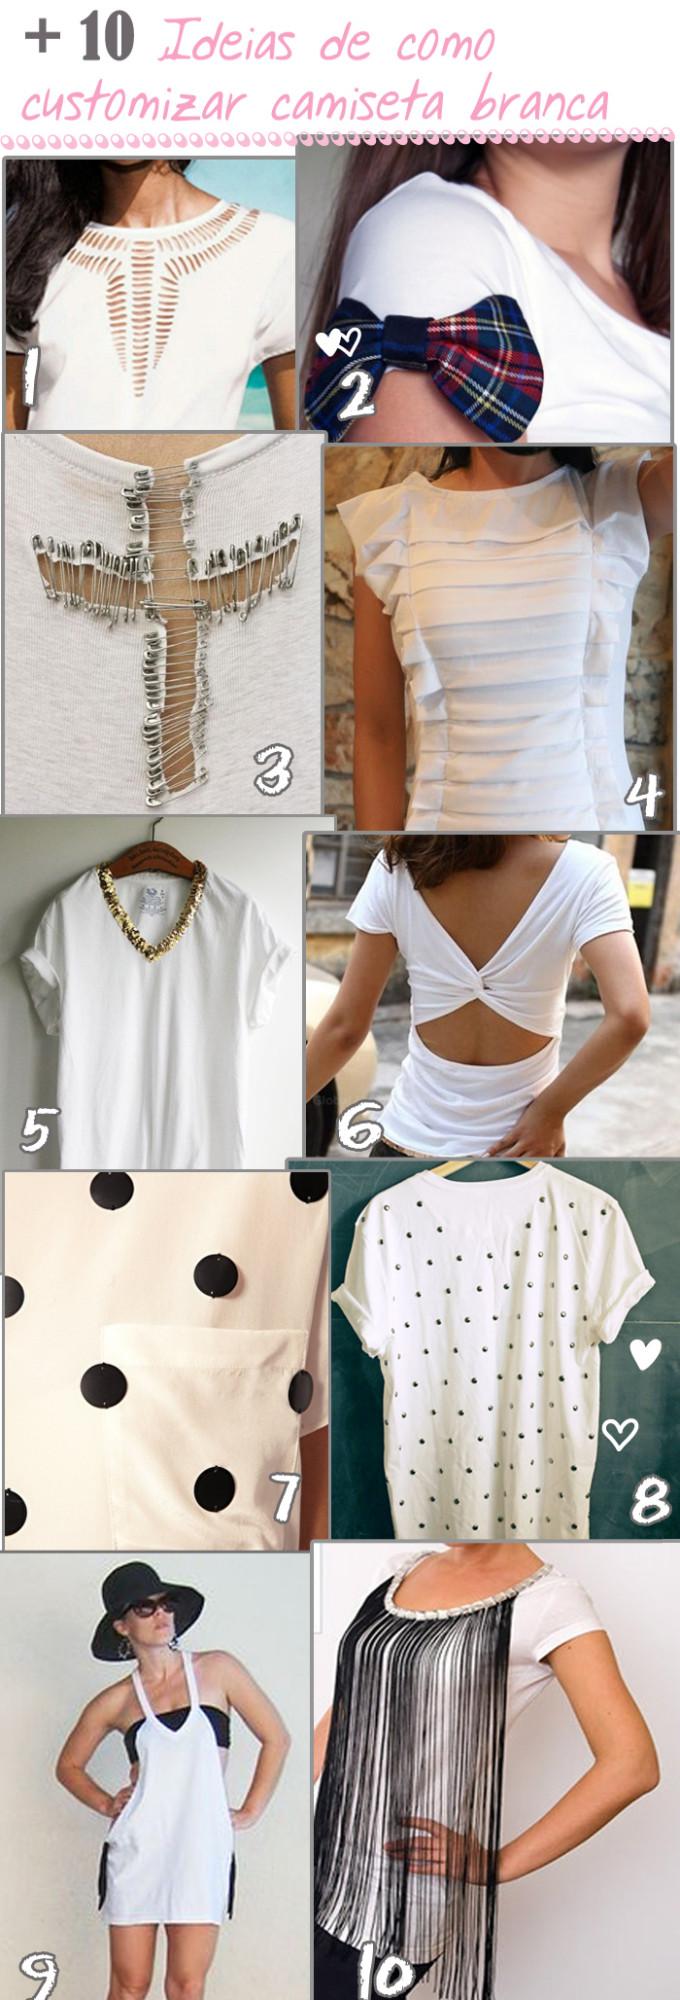 diy t-shirts branca